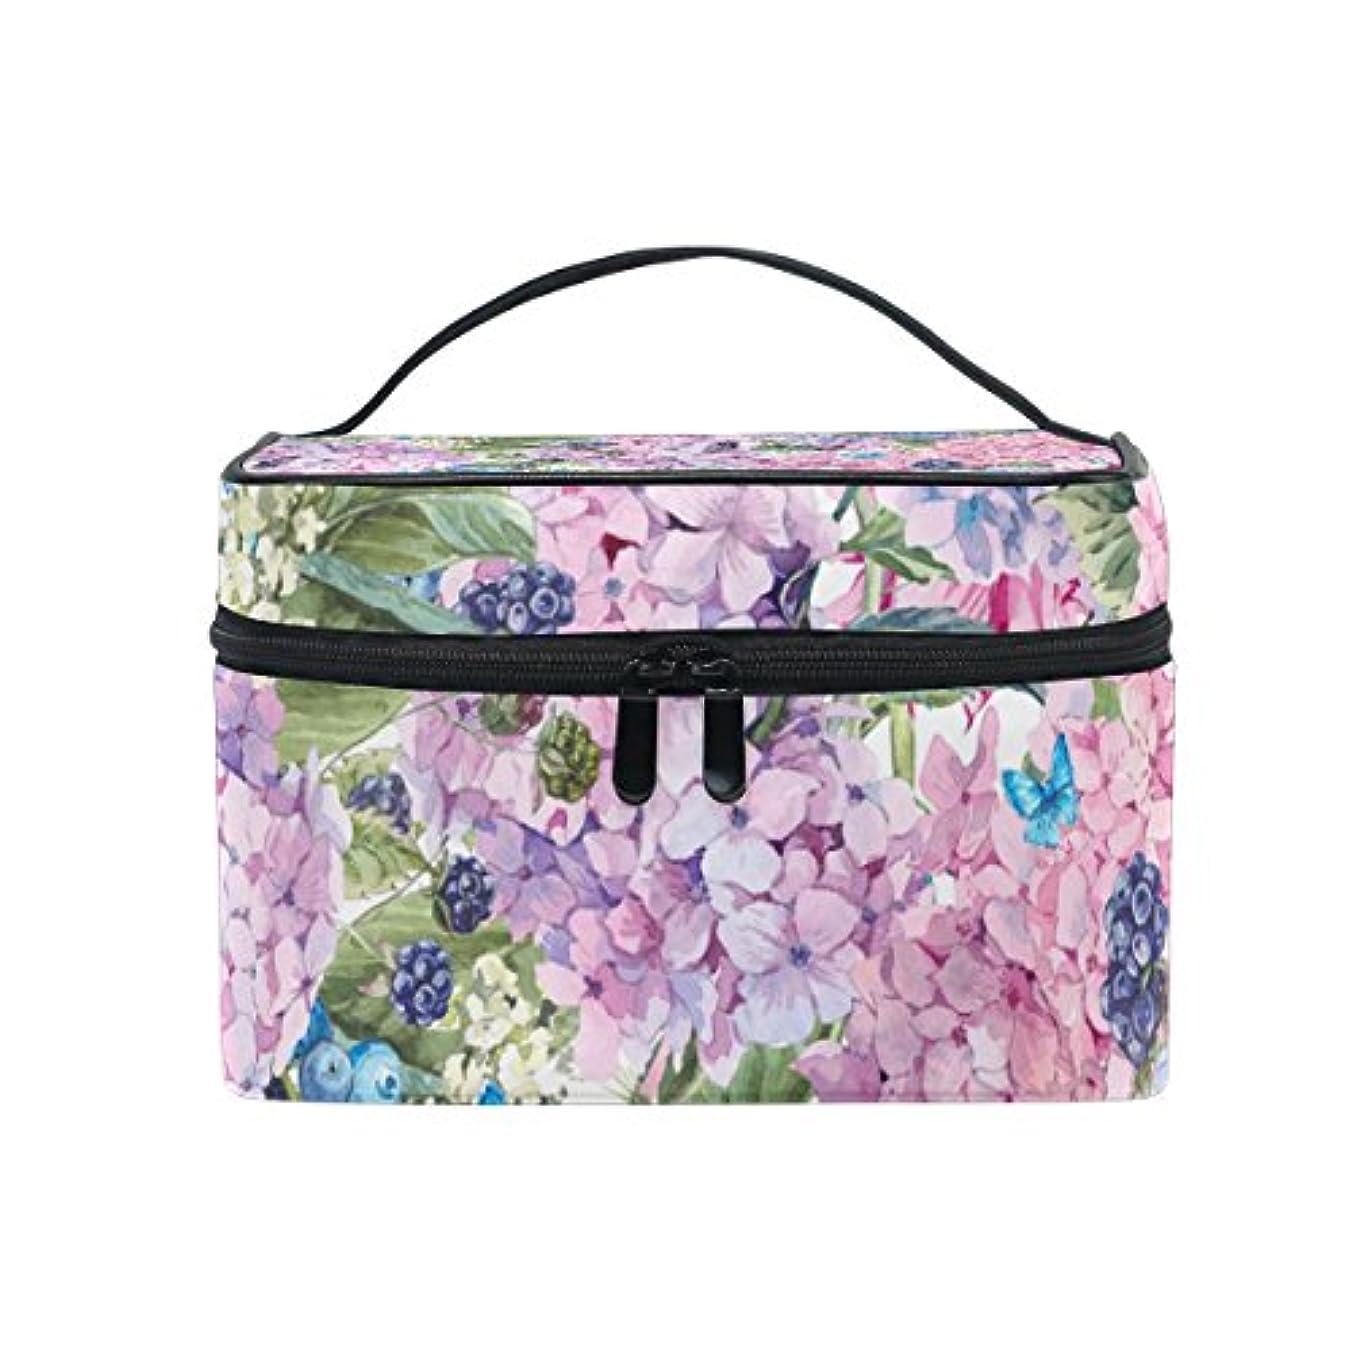 Natax 化粧ポーチ 大容量 かわいい おしゃれ 機能的 バニティポーチ 収納ケース ポーチ メイクポーチ ボックス 小物入れ 仕切り 旅行 出張 持ち運び便利 コンパクト咲く春の花が咲く